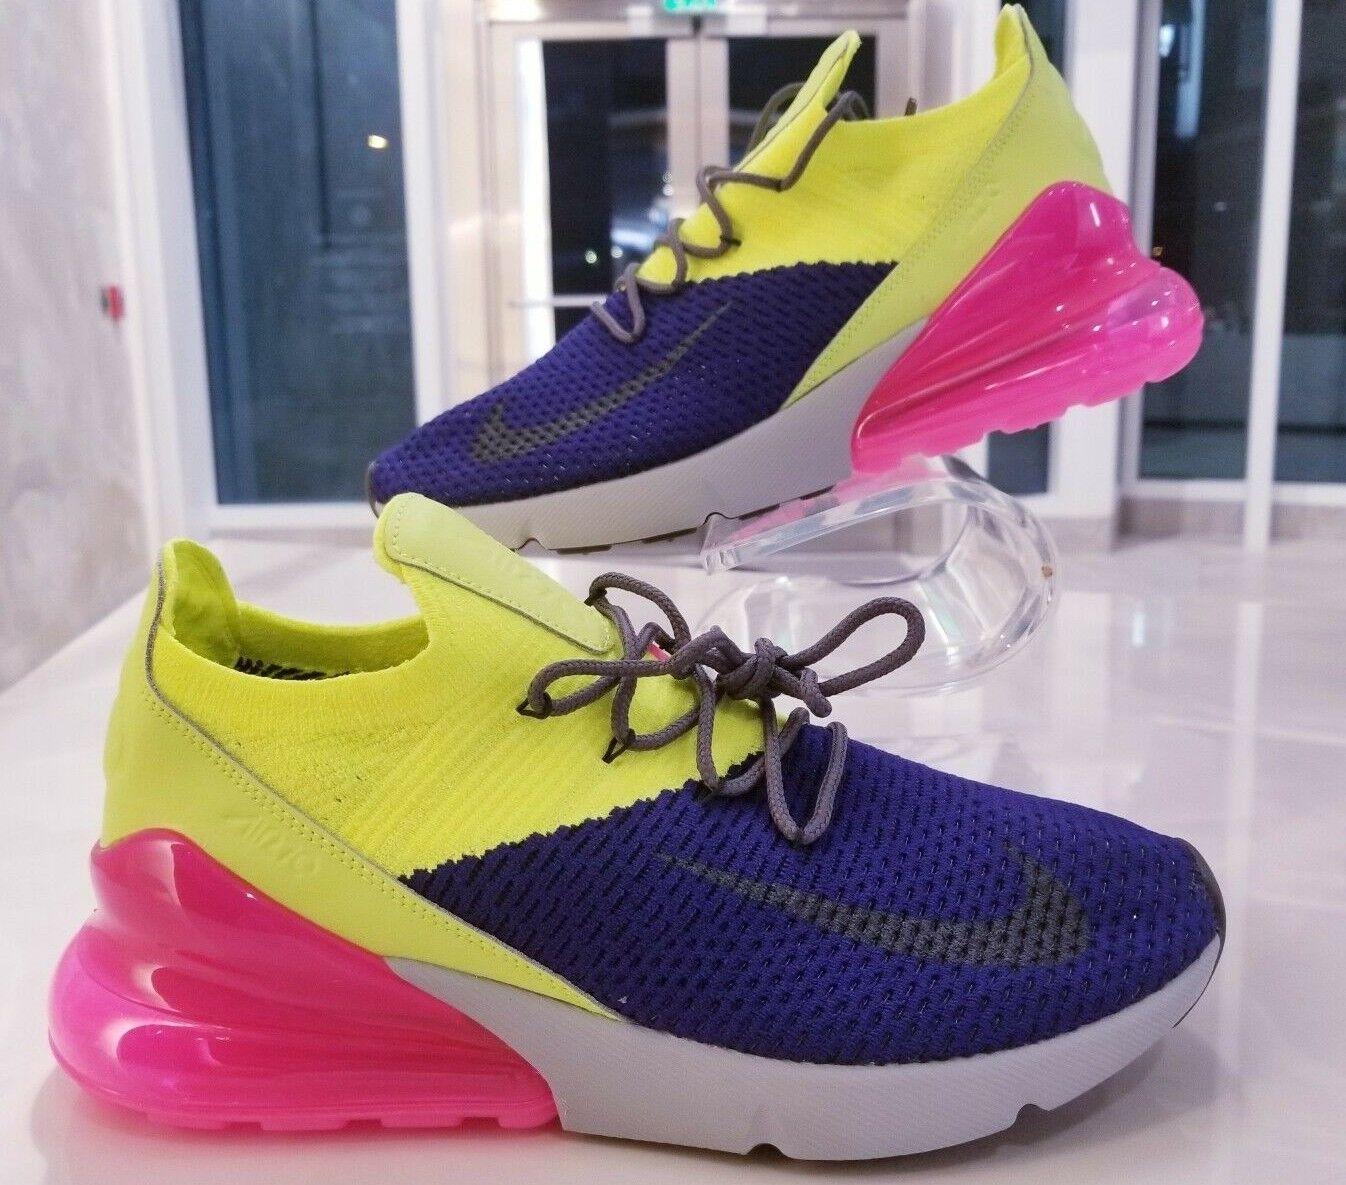 Nike Air Max 270 Flyknit Running shoes Volt Purple Pink Grey SZ ( AO1023-501 )